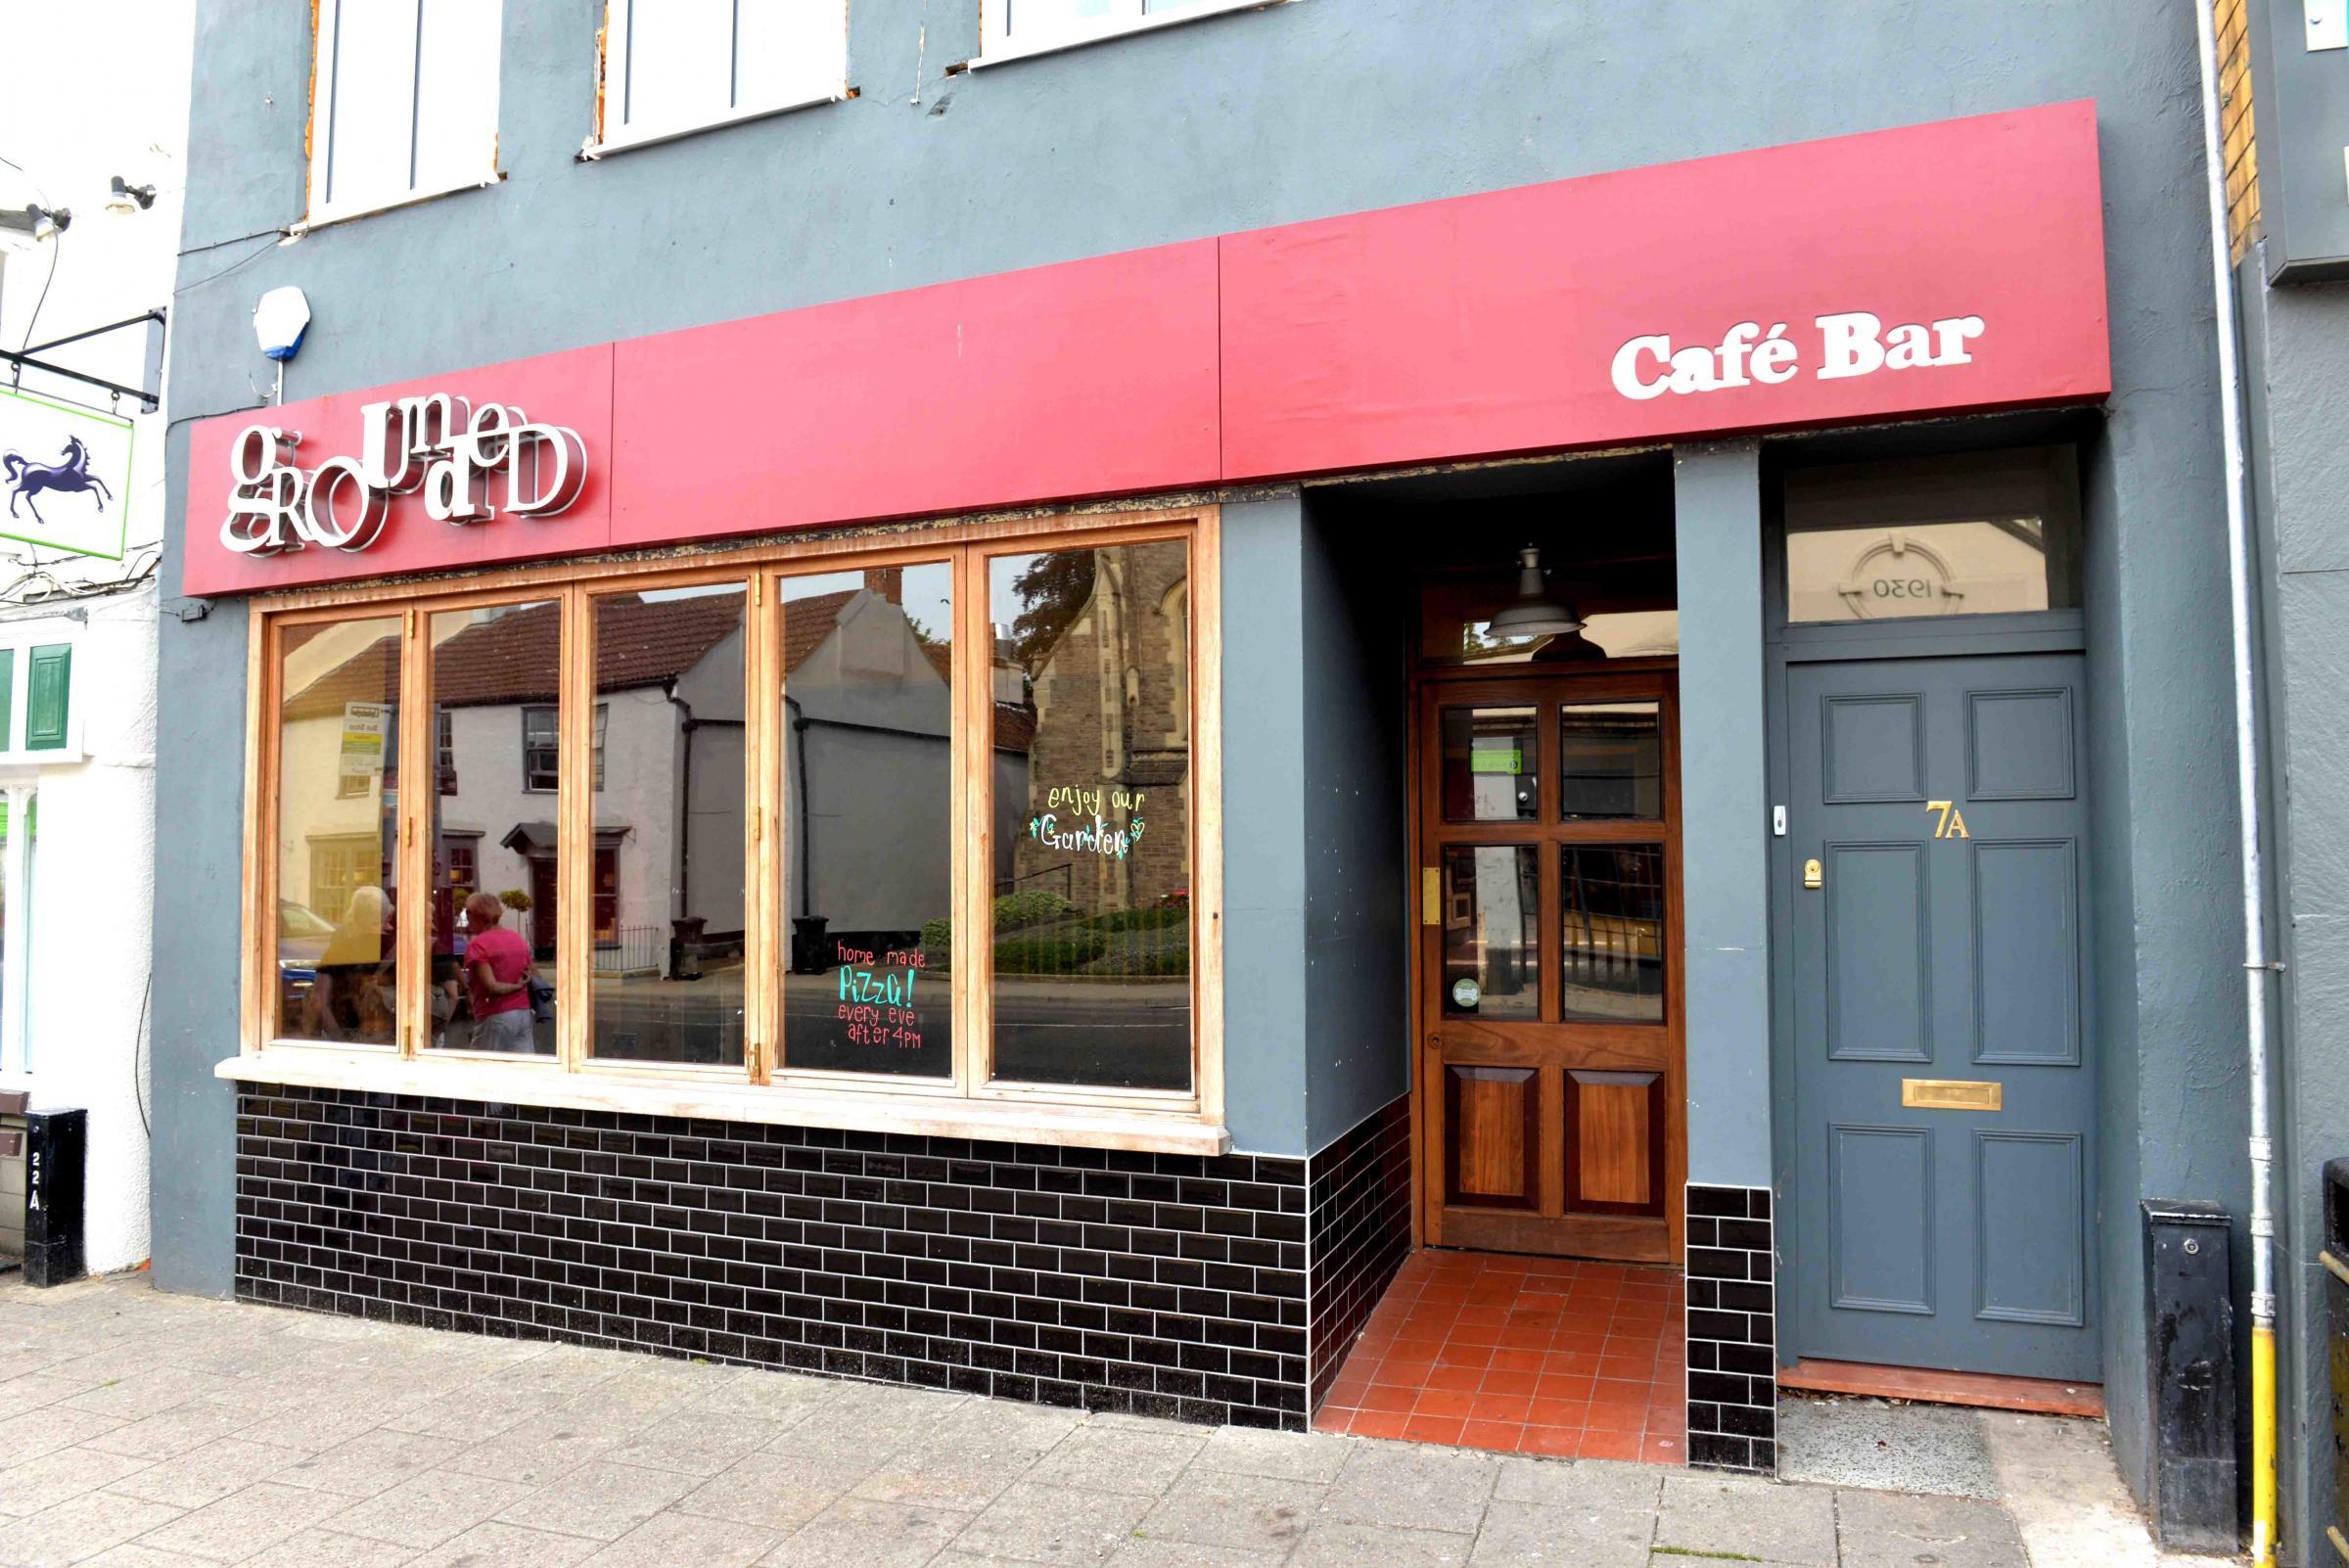 Thornbury's Café Grounded closed as company enters